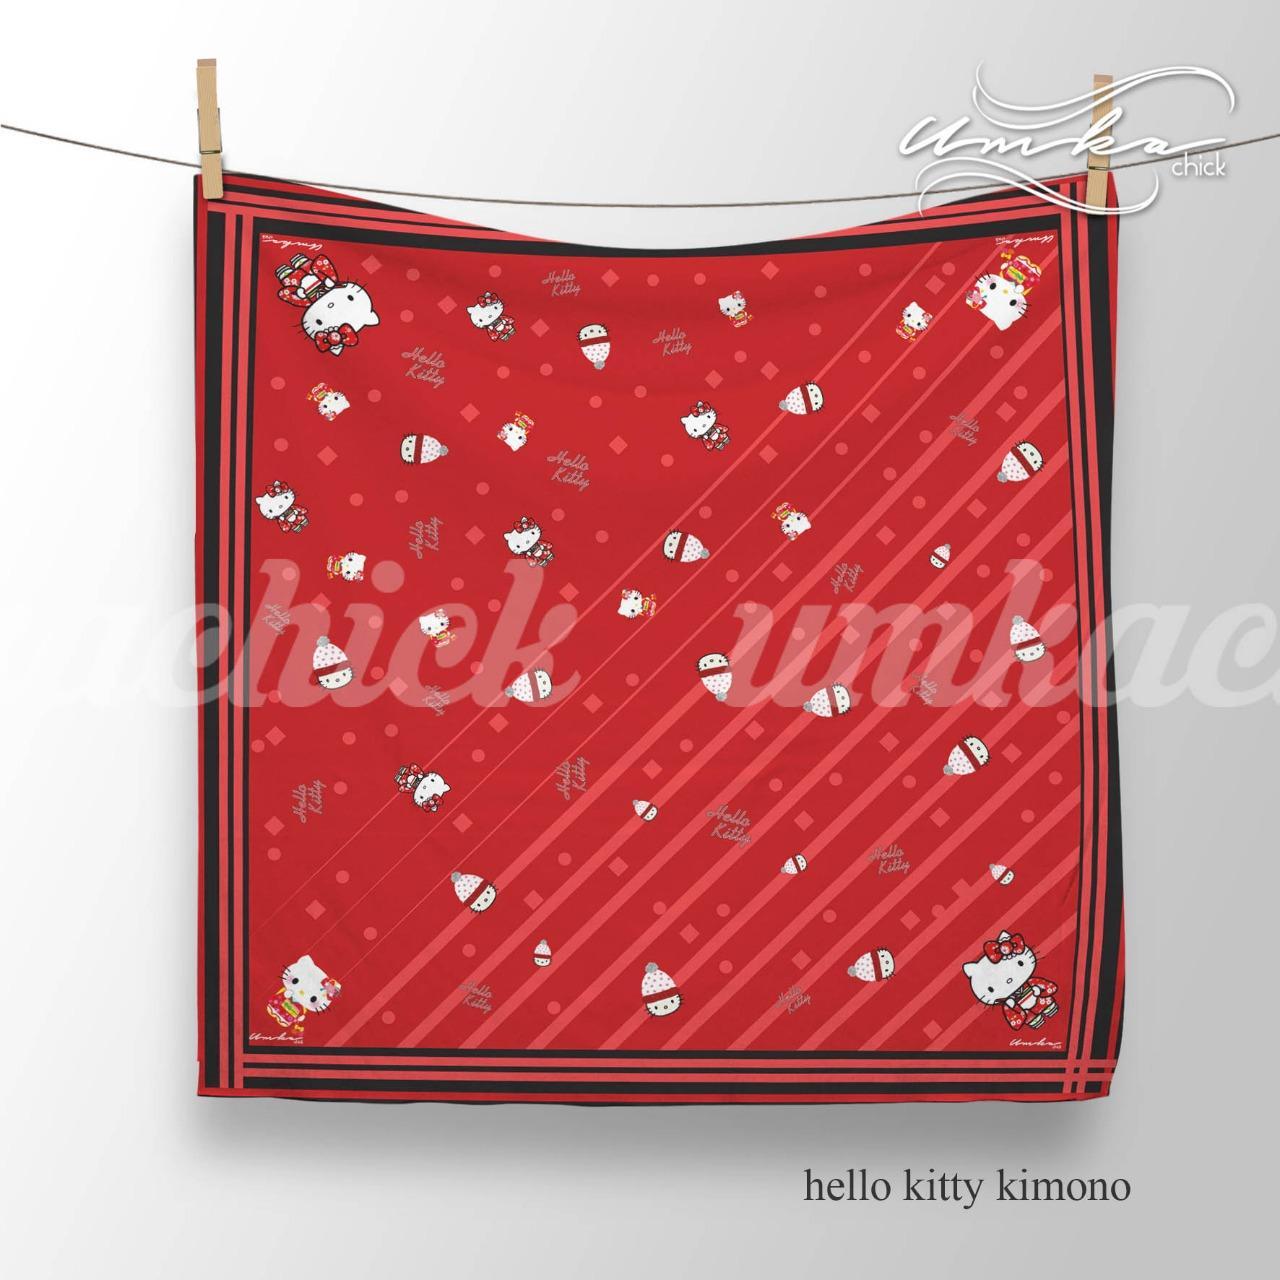 Jual Loz 9408 Gift Large Hello Kitty Kimono Harga Rp 104000 Handuk Hijab Kerudung Segi Empat Voal